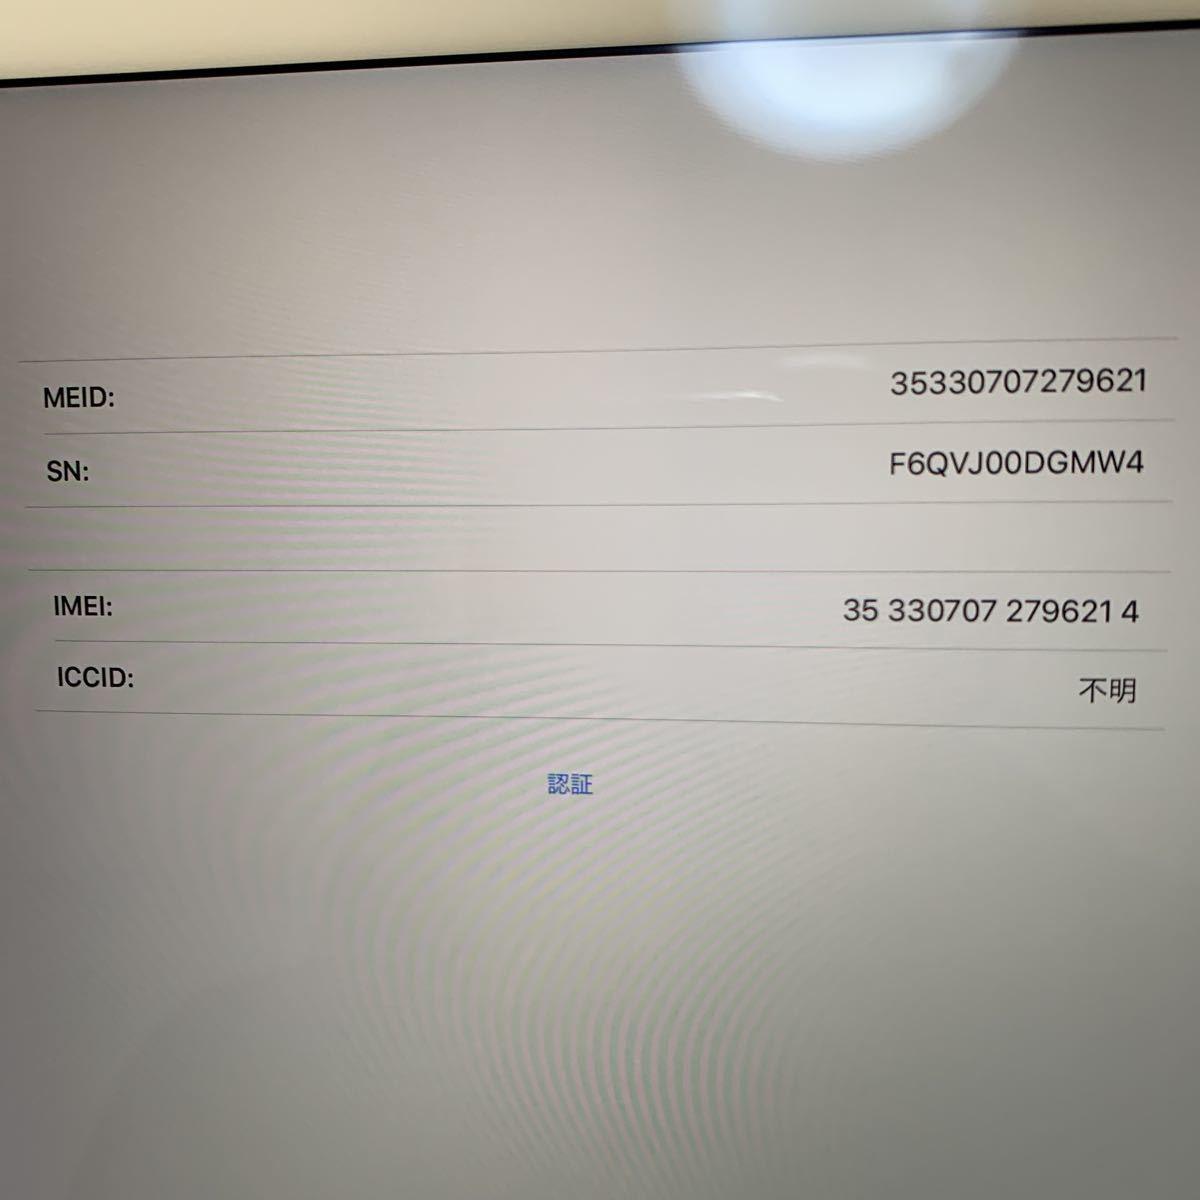 iPad Pro 12.9インチ Wi-Fi+Cellular 第1世代 SIMフリー化 シルバー_画像4